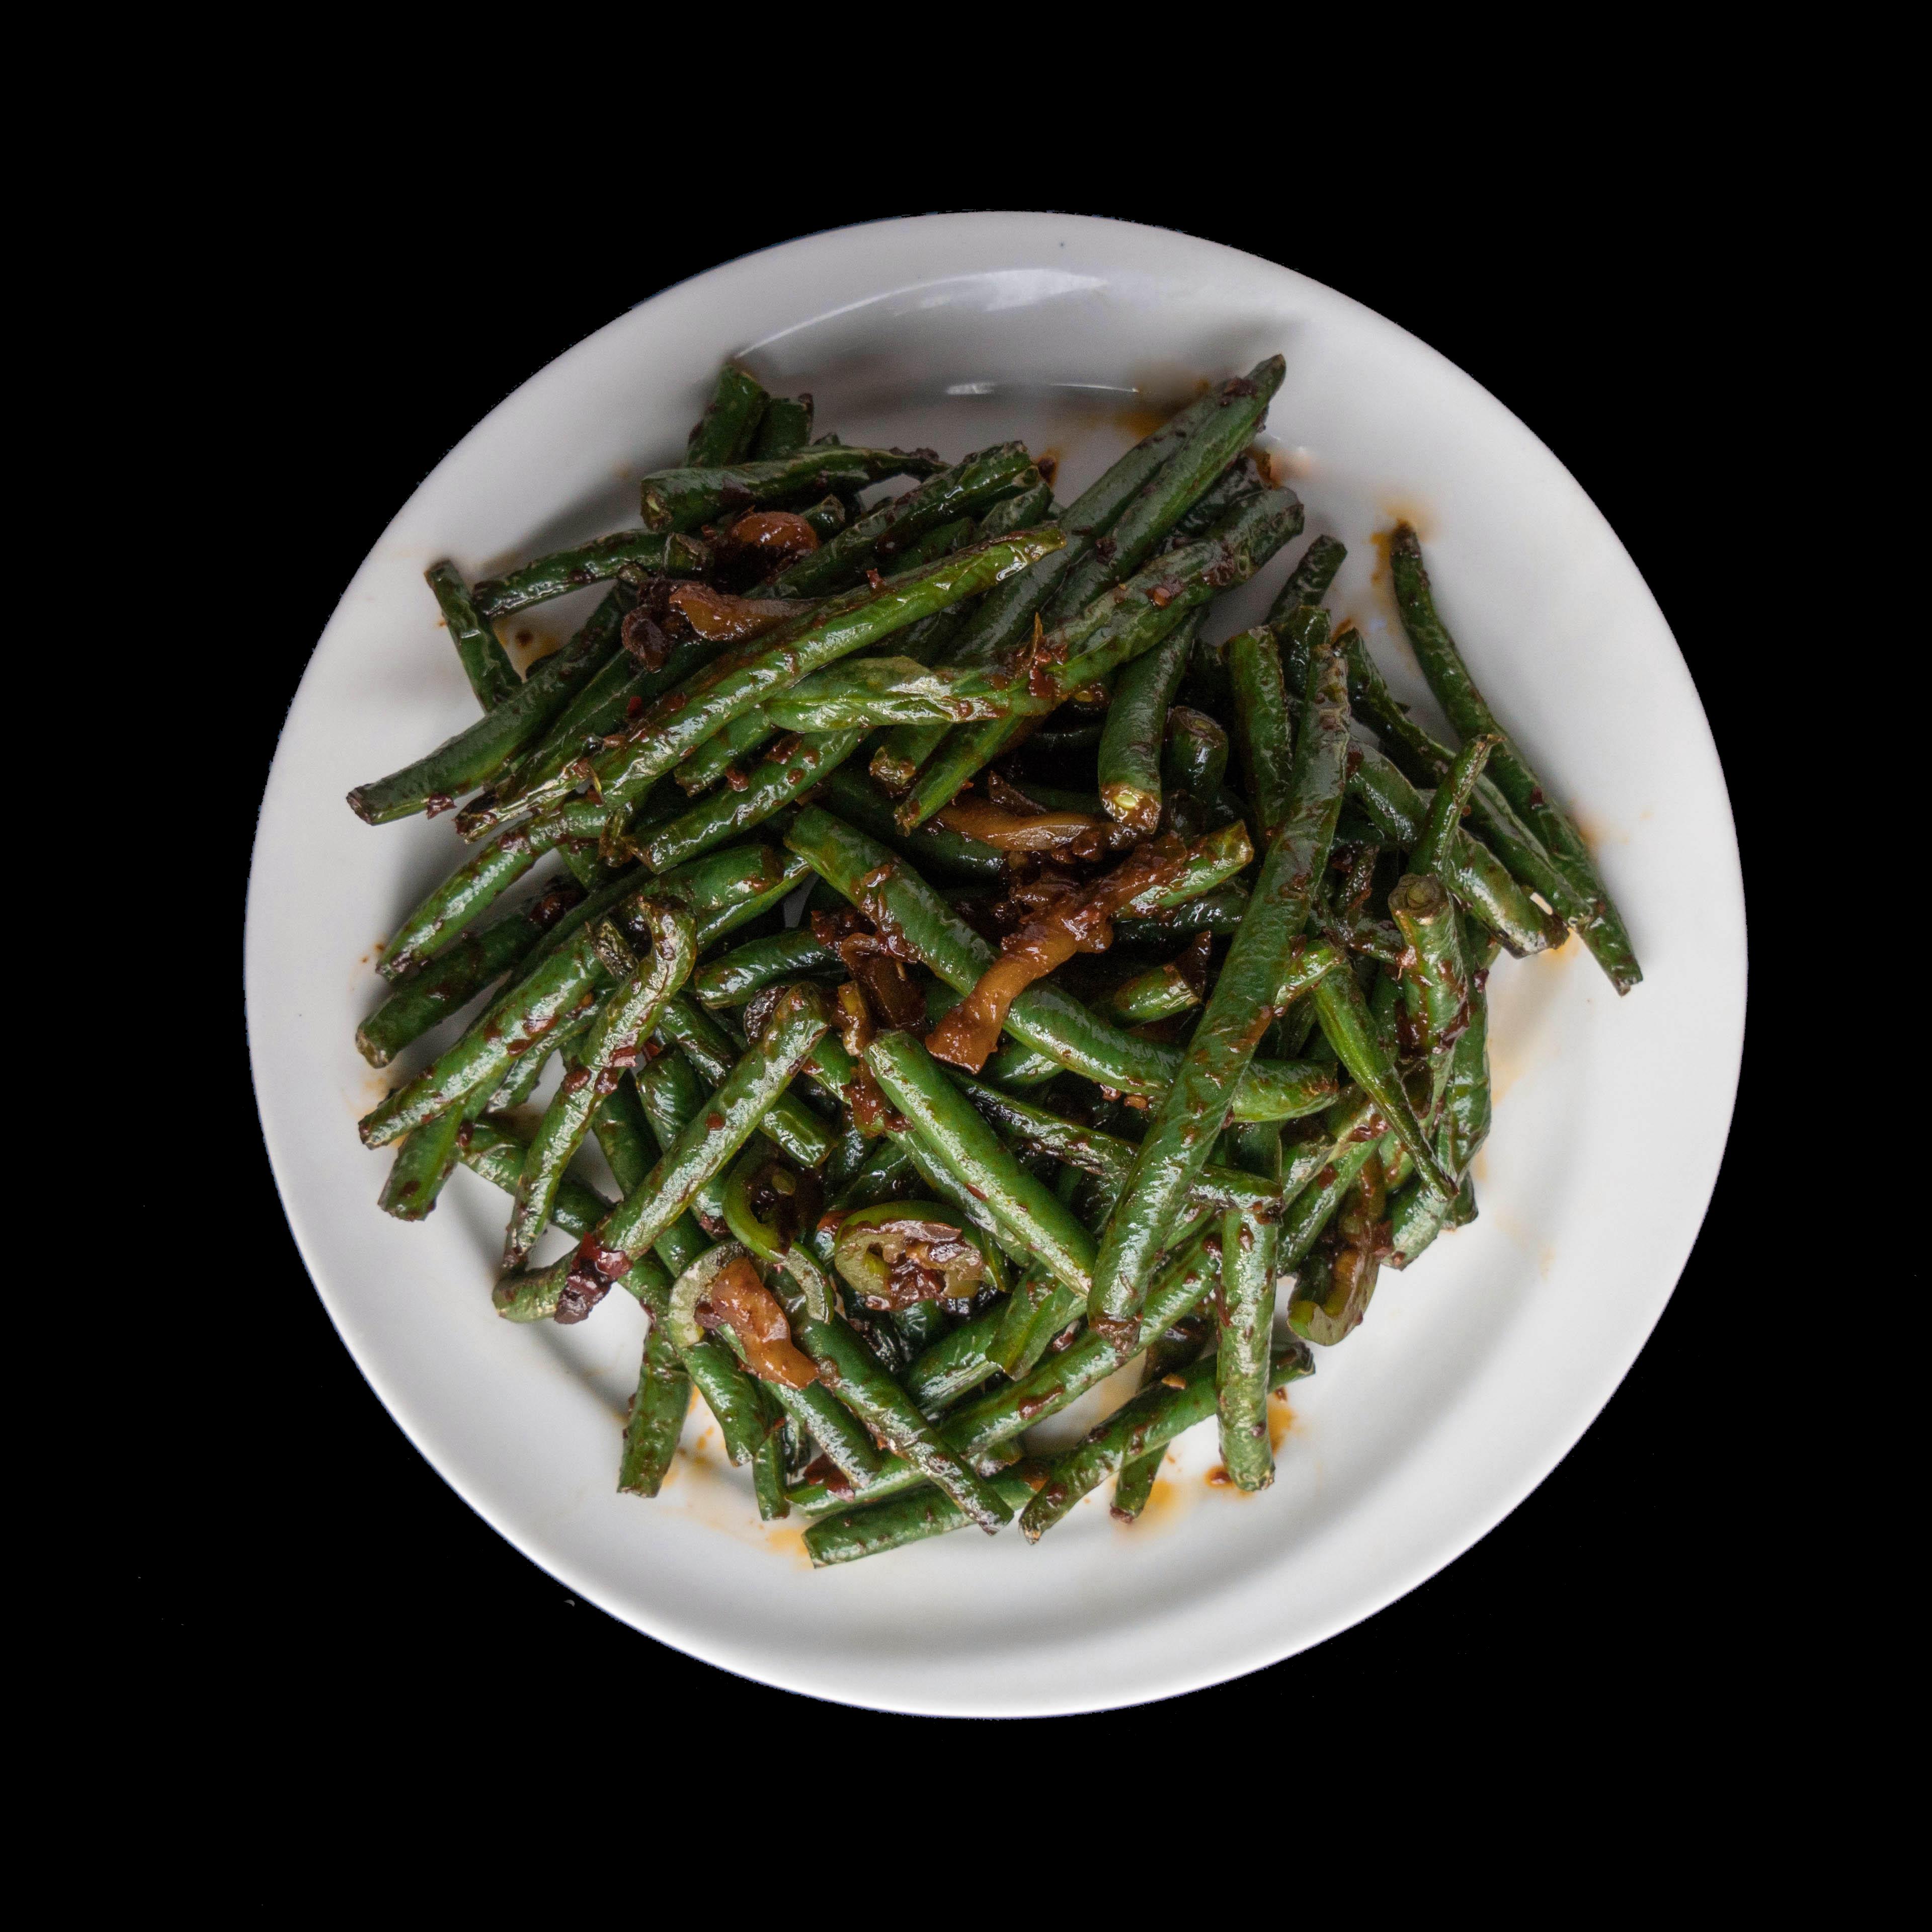 63. 干煸四季豆 House Special Green Beans Image